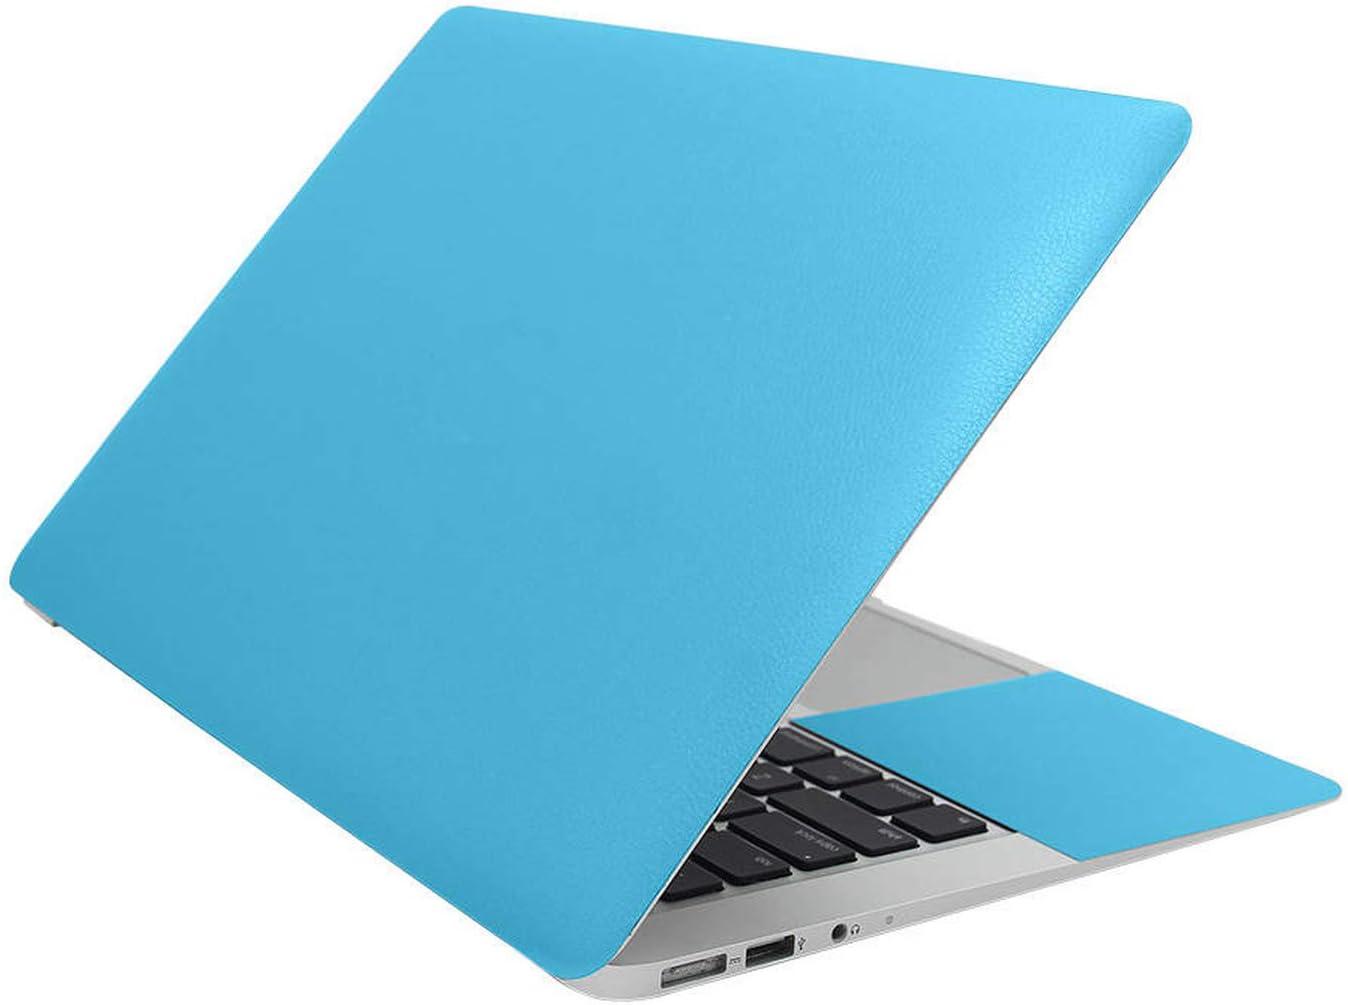 hp//acer//xiaomi grigio grigio 10inch 27x17cm Colore laptop skin notebook adesivi per 15 15,6 13 13,3 14 computer laptop cover skin per MacBook